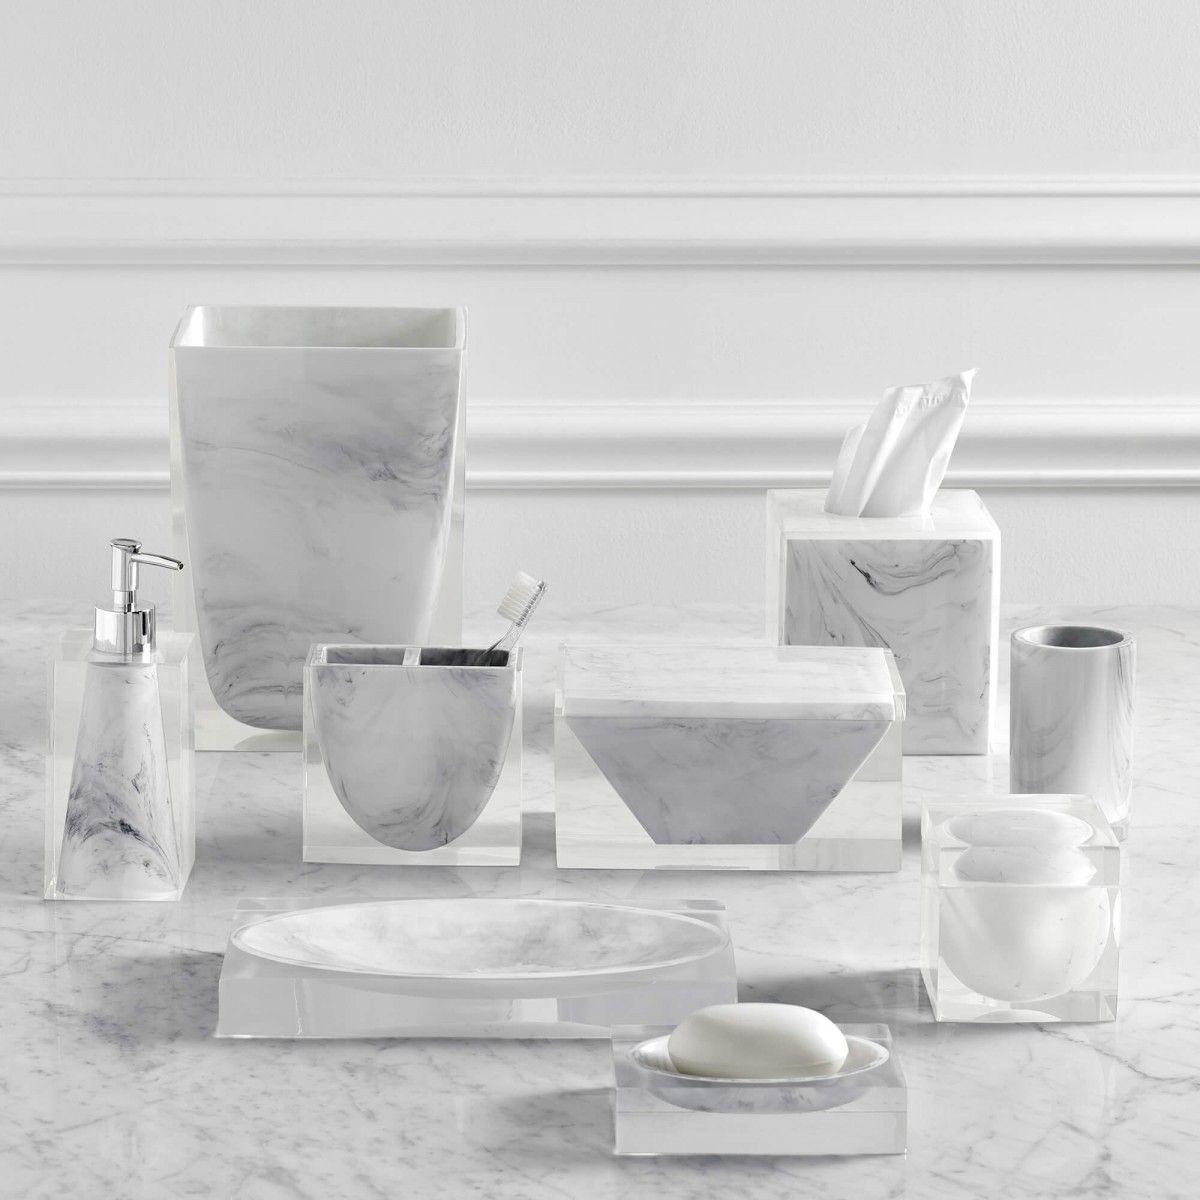 Kassatex Ducale White Bath Accessories Bathroom Decor